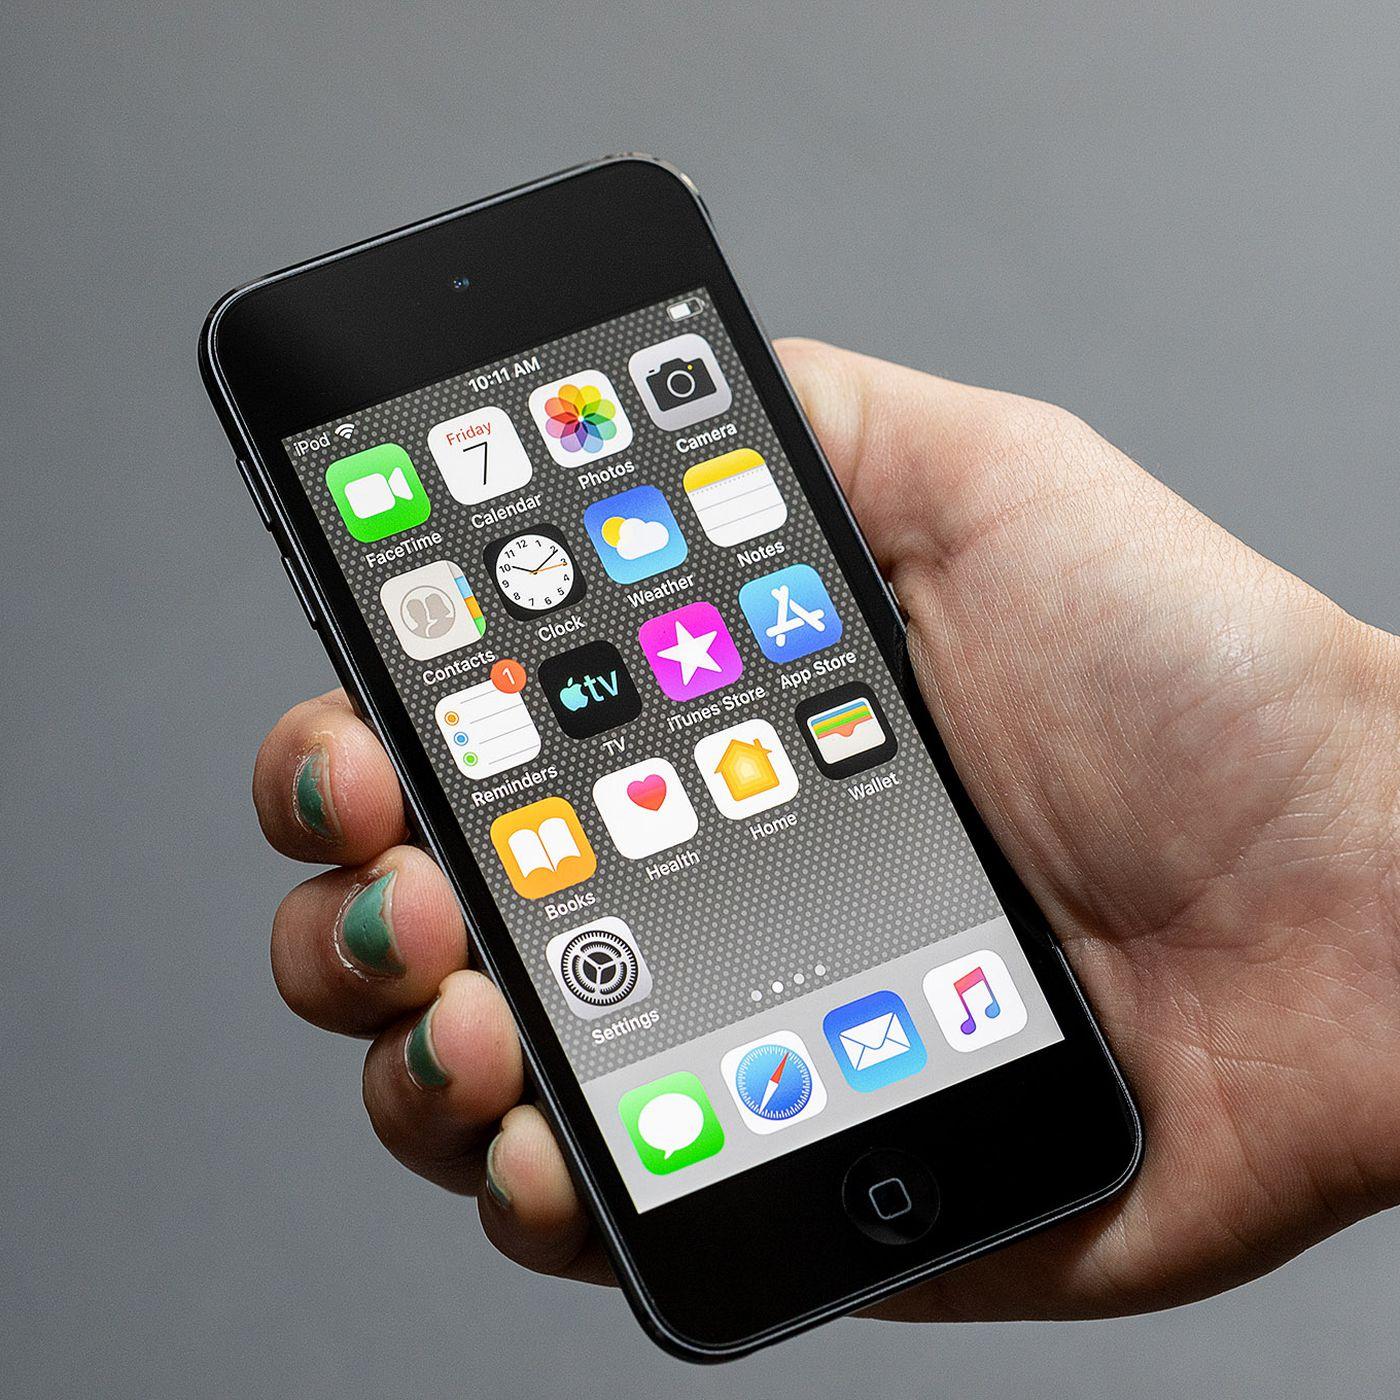 iPod Touch – A Tech For Kids Tool That Makes Sense